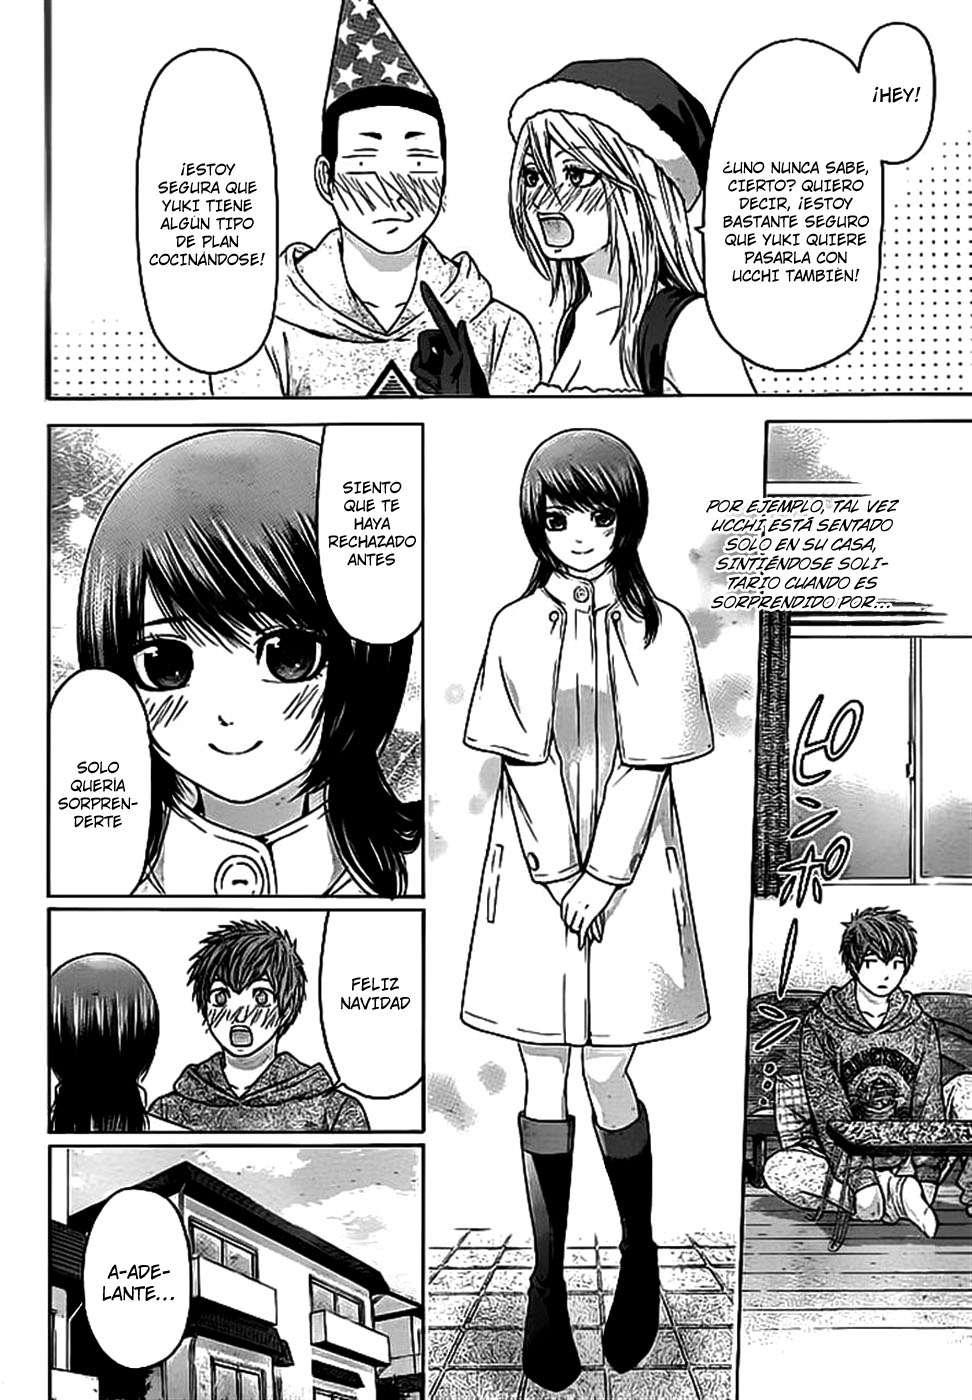 http://c5.ninemanga.com/es_manga/35/419/482050/228c0b1e694556fd5db5b1e711080fe0.jpg Page 6